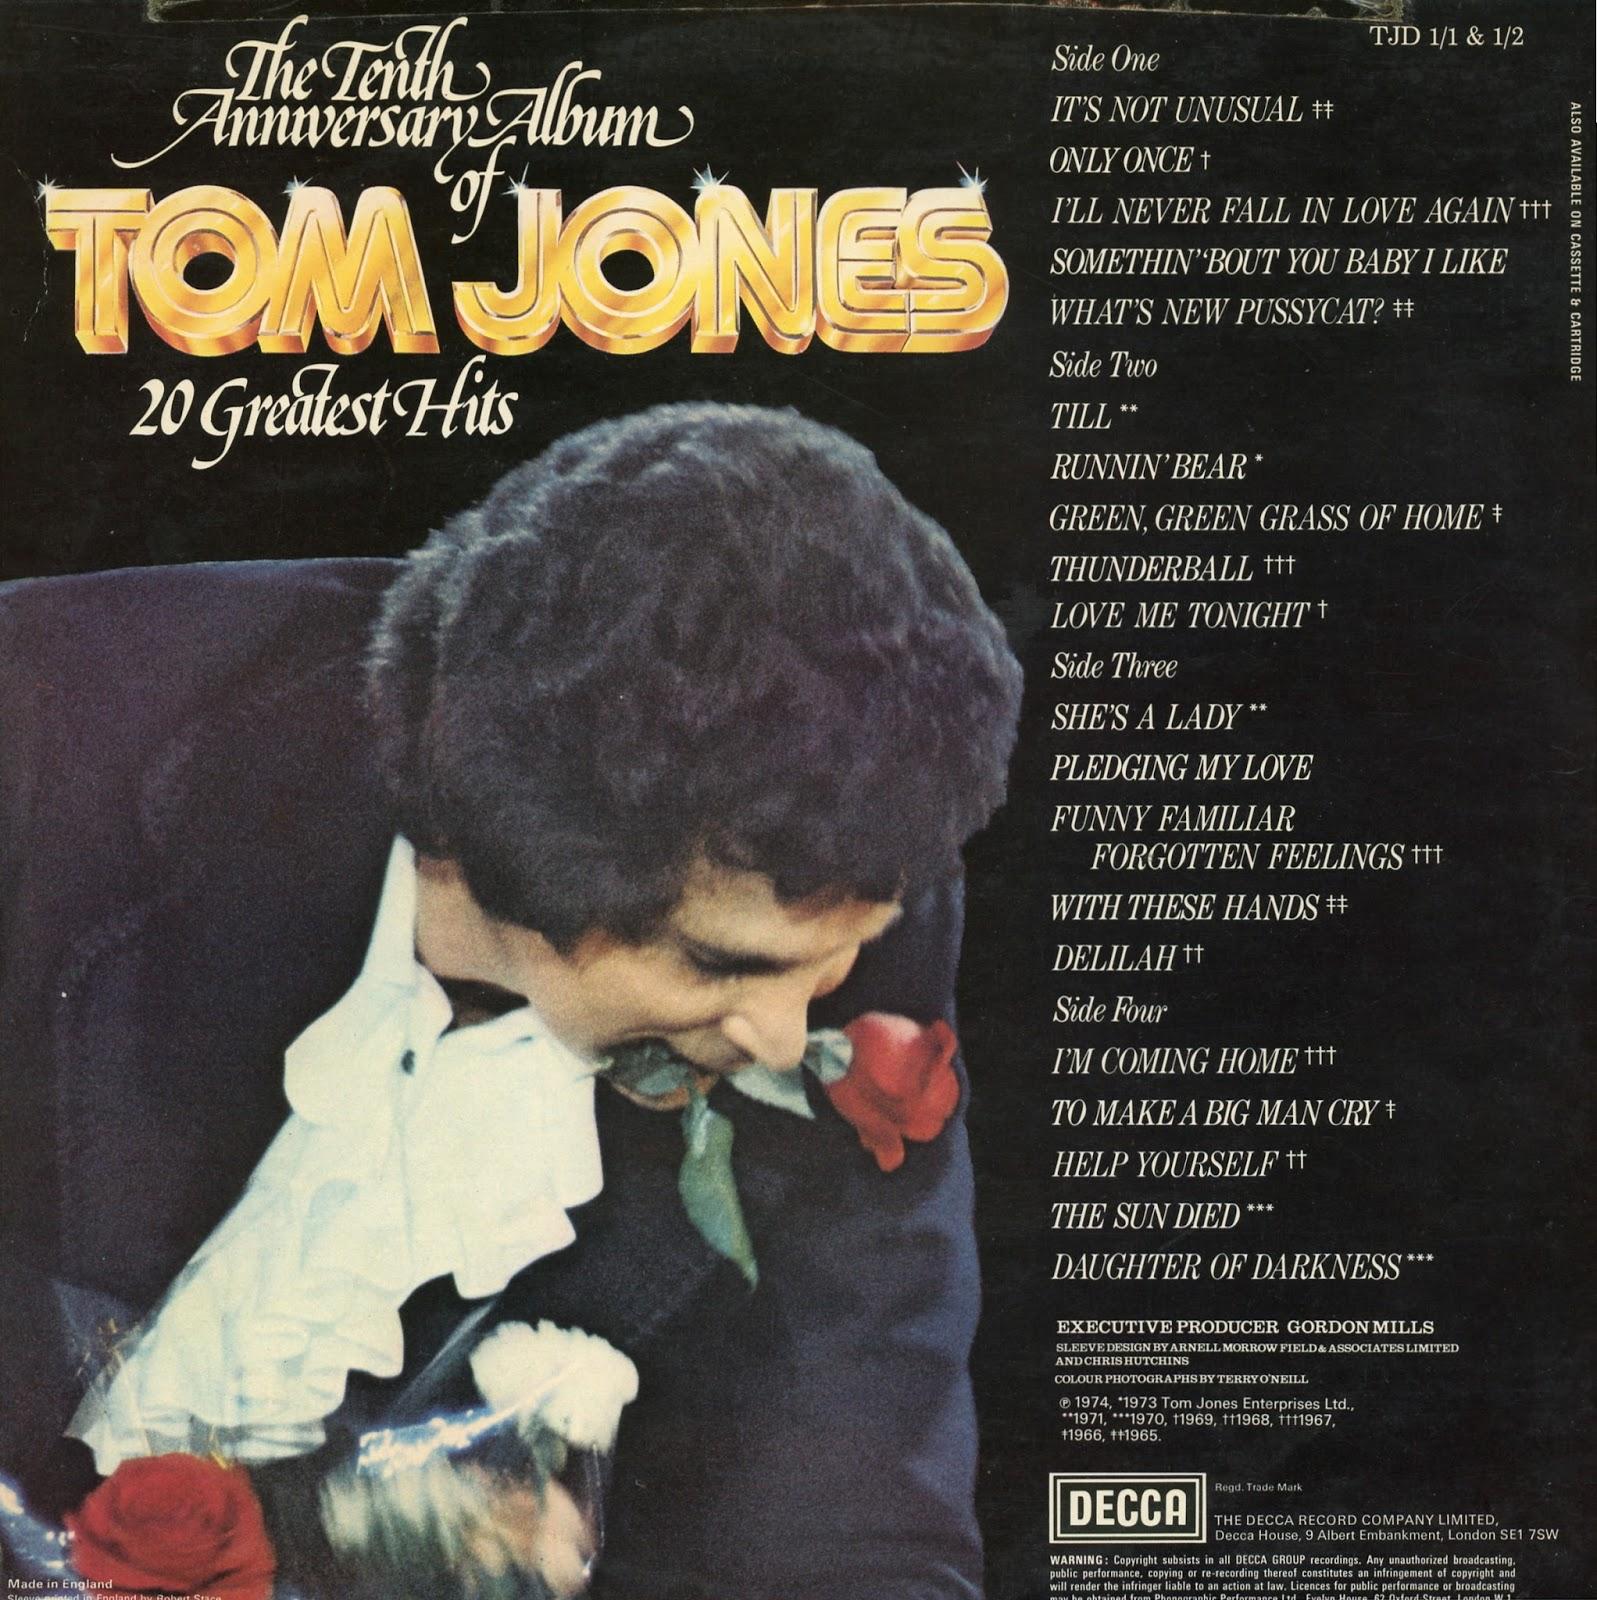 Tom Jones - Runnin' Bear = Oso Corredor